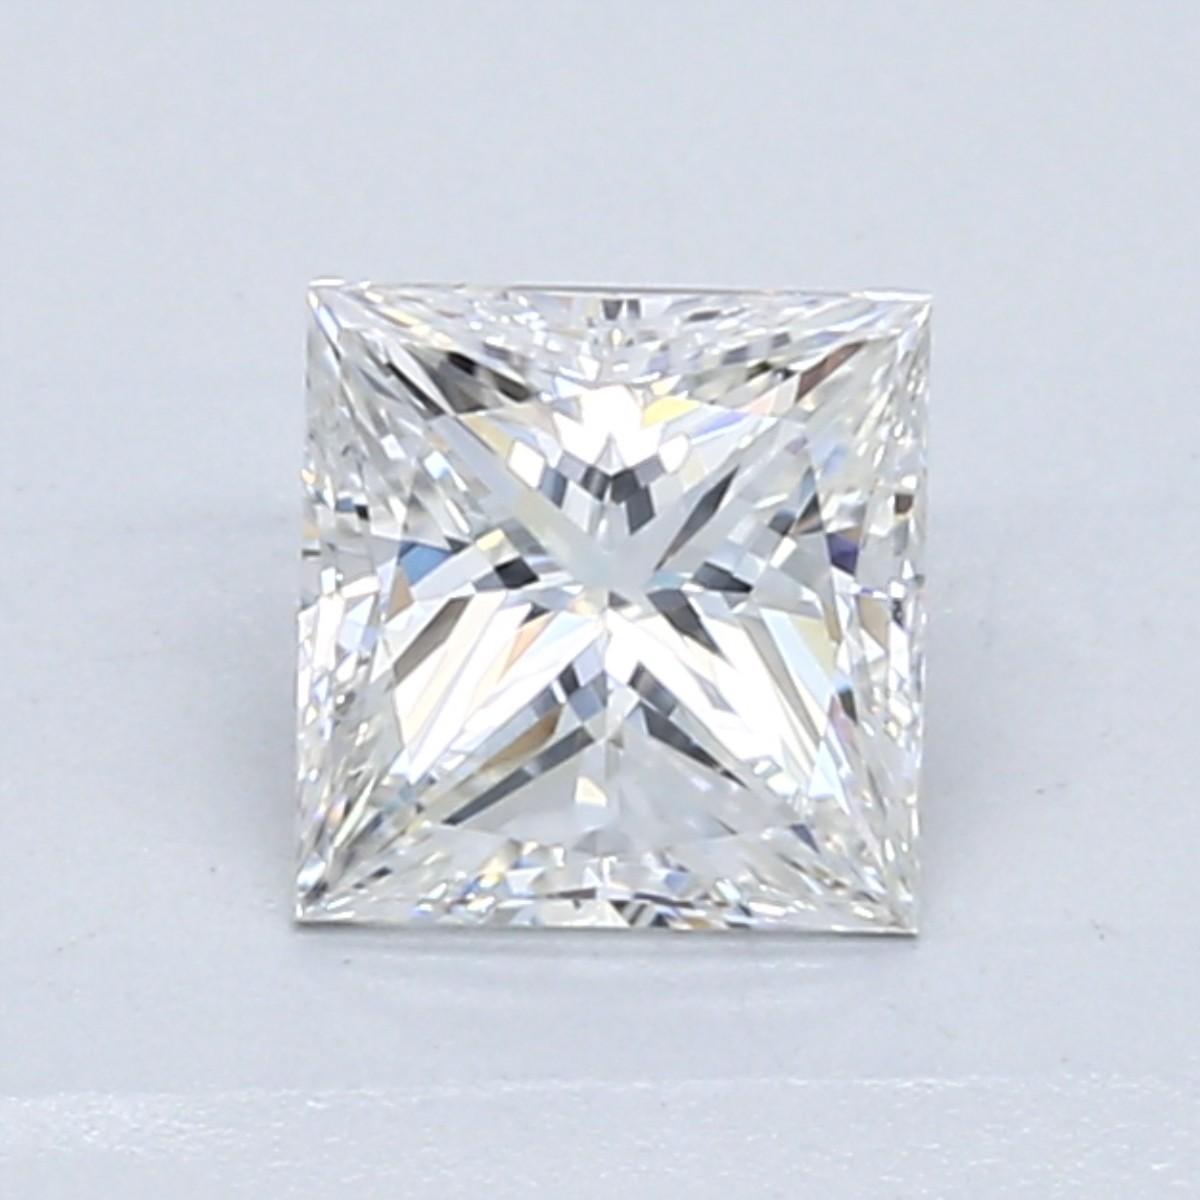 Blue Nile 1.04克拉公主方形钻石(切工VG,成色F色,净度VVS2)